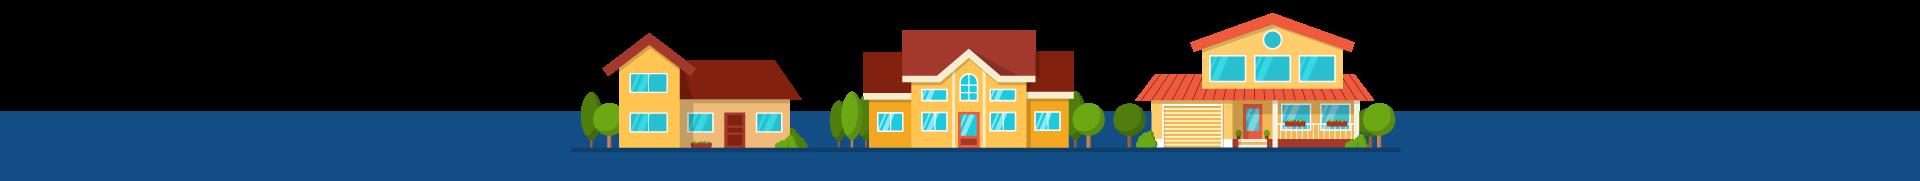 HomeEquity_Row2_Illustration